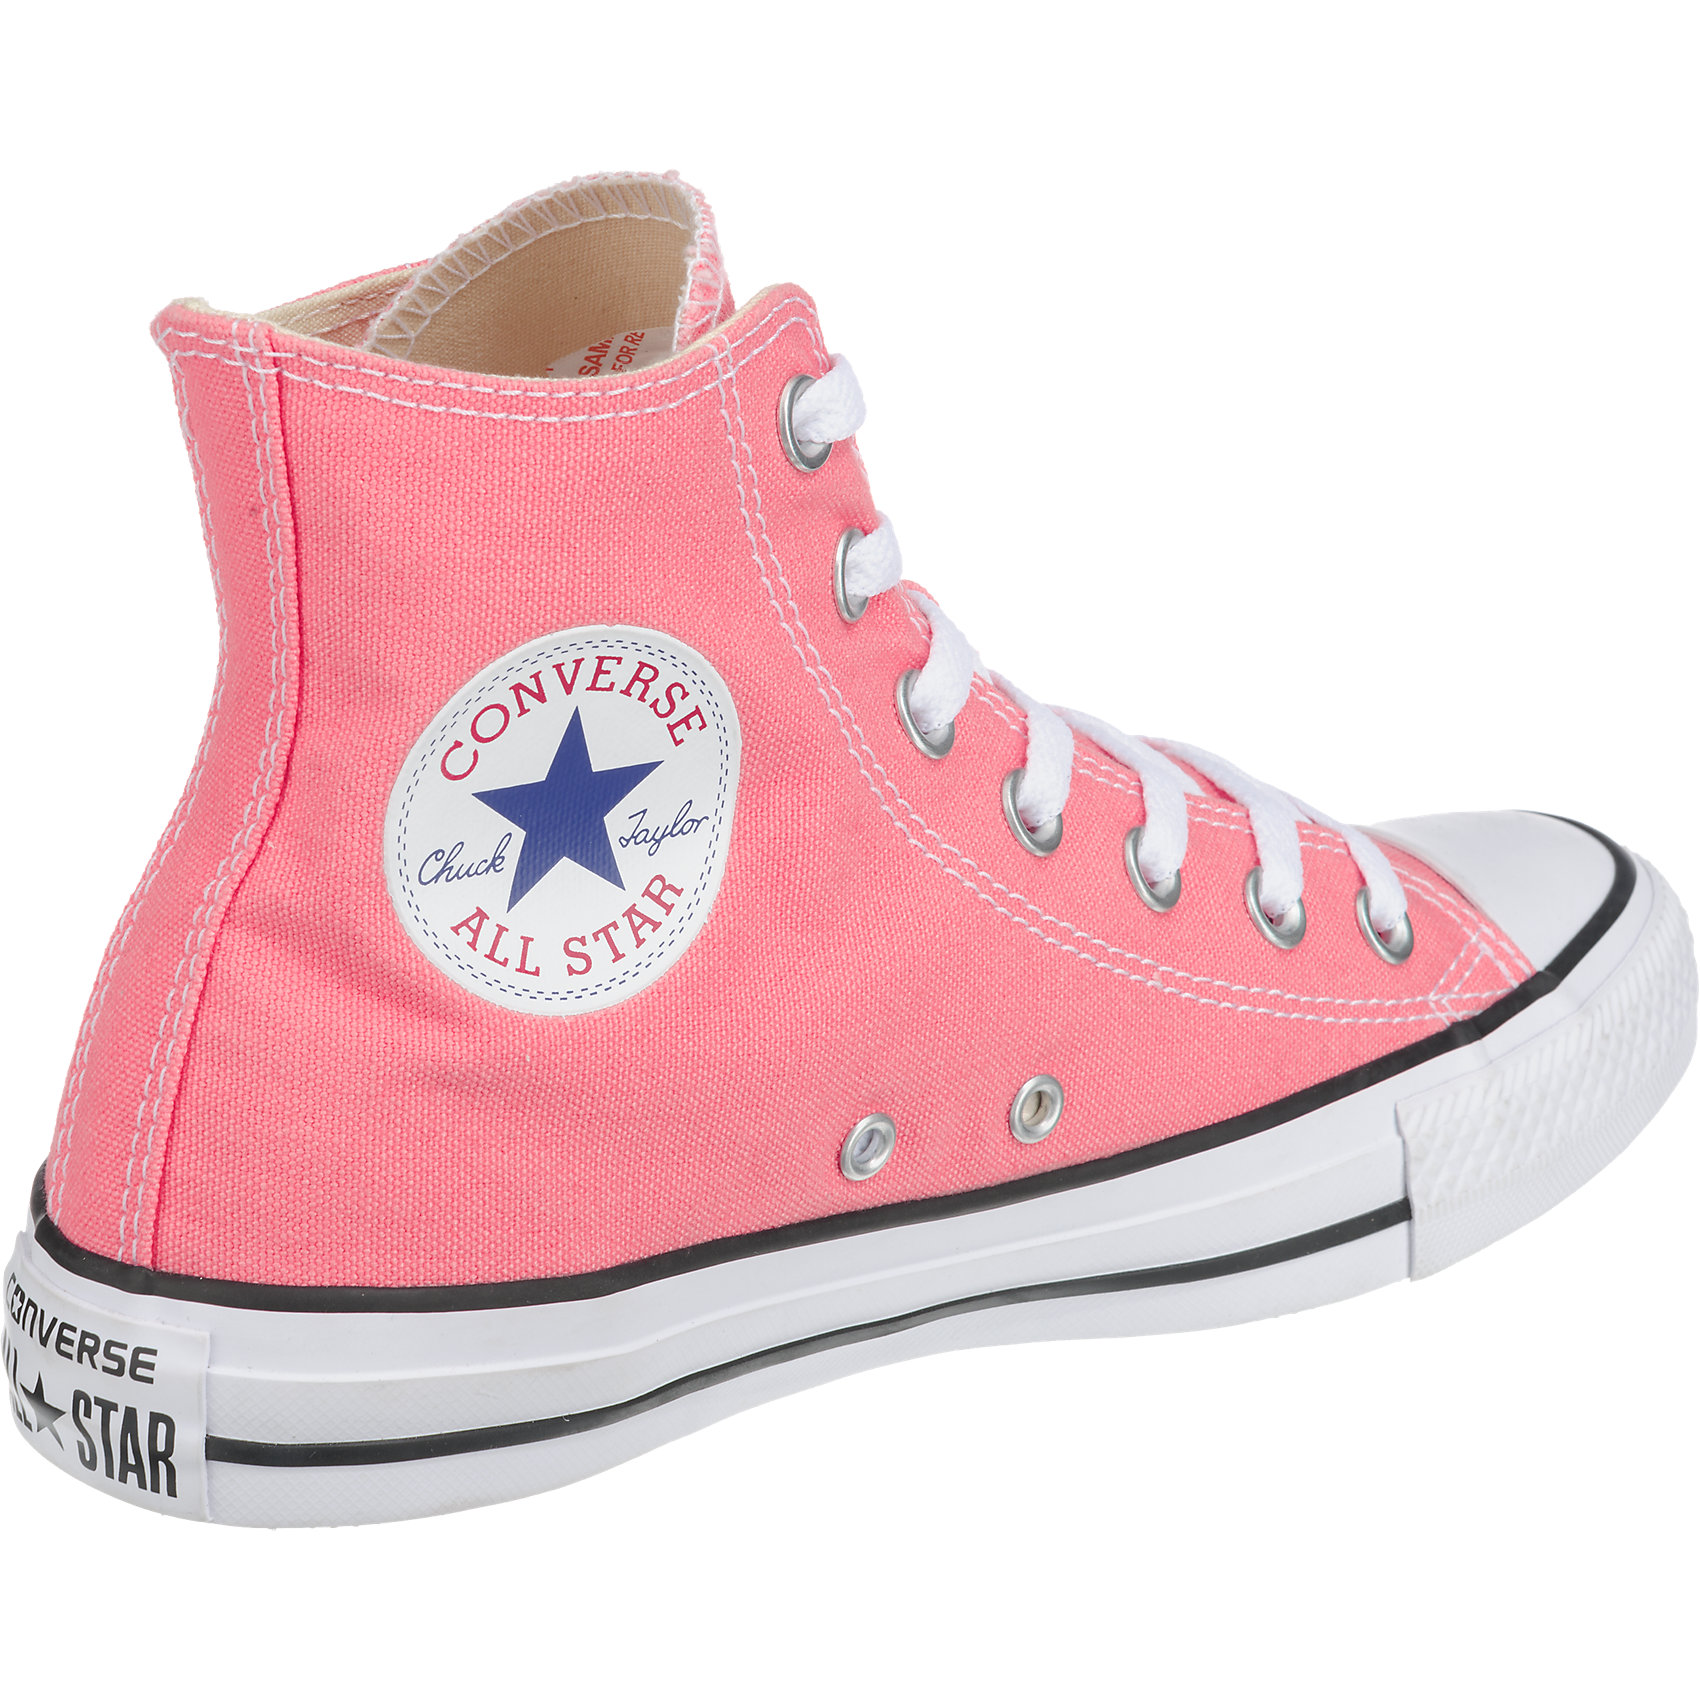 Neu CONVERSE Chuck Taylor All Star High Sneakers rosa 6987279